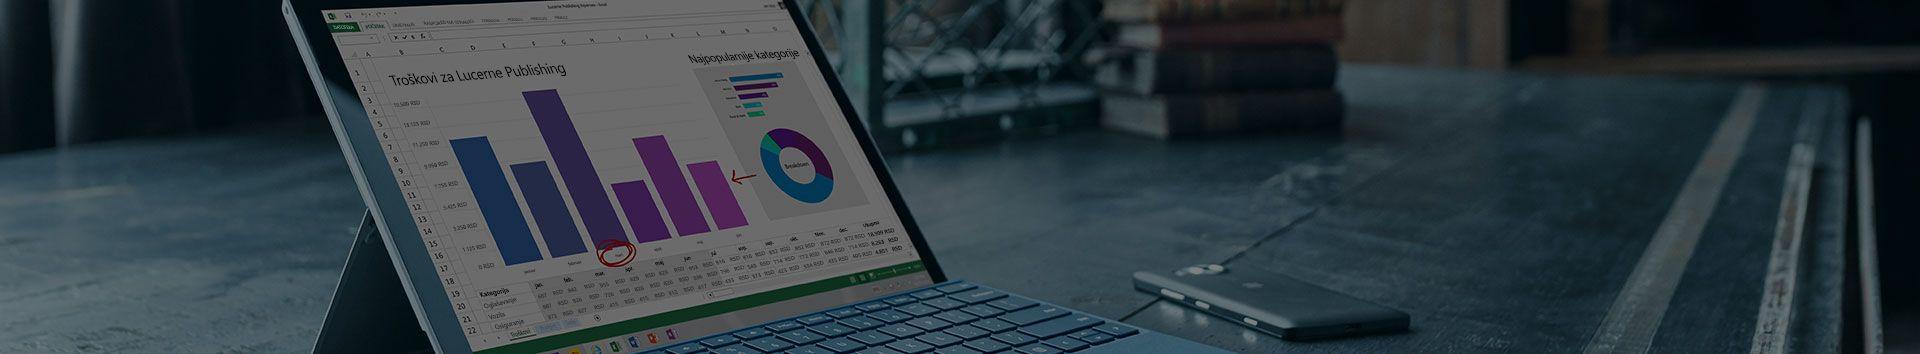 Microsoft Surface tablet prikazuje izveštaj o troškovima na Microsoft Excel slici